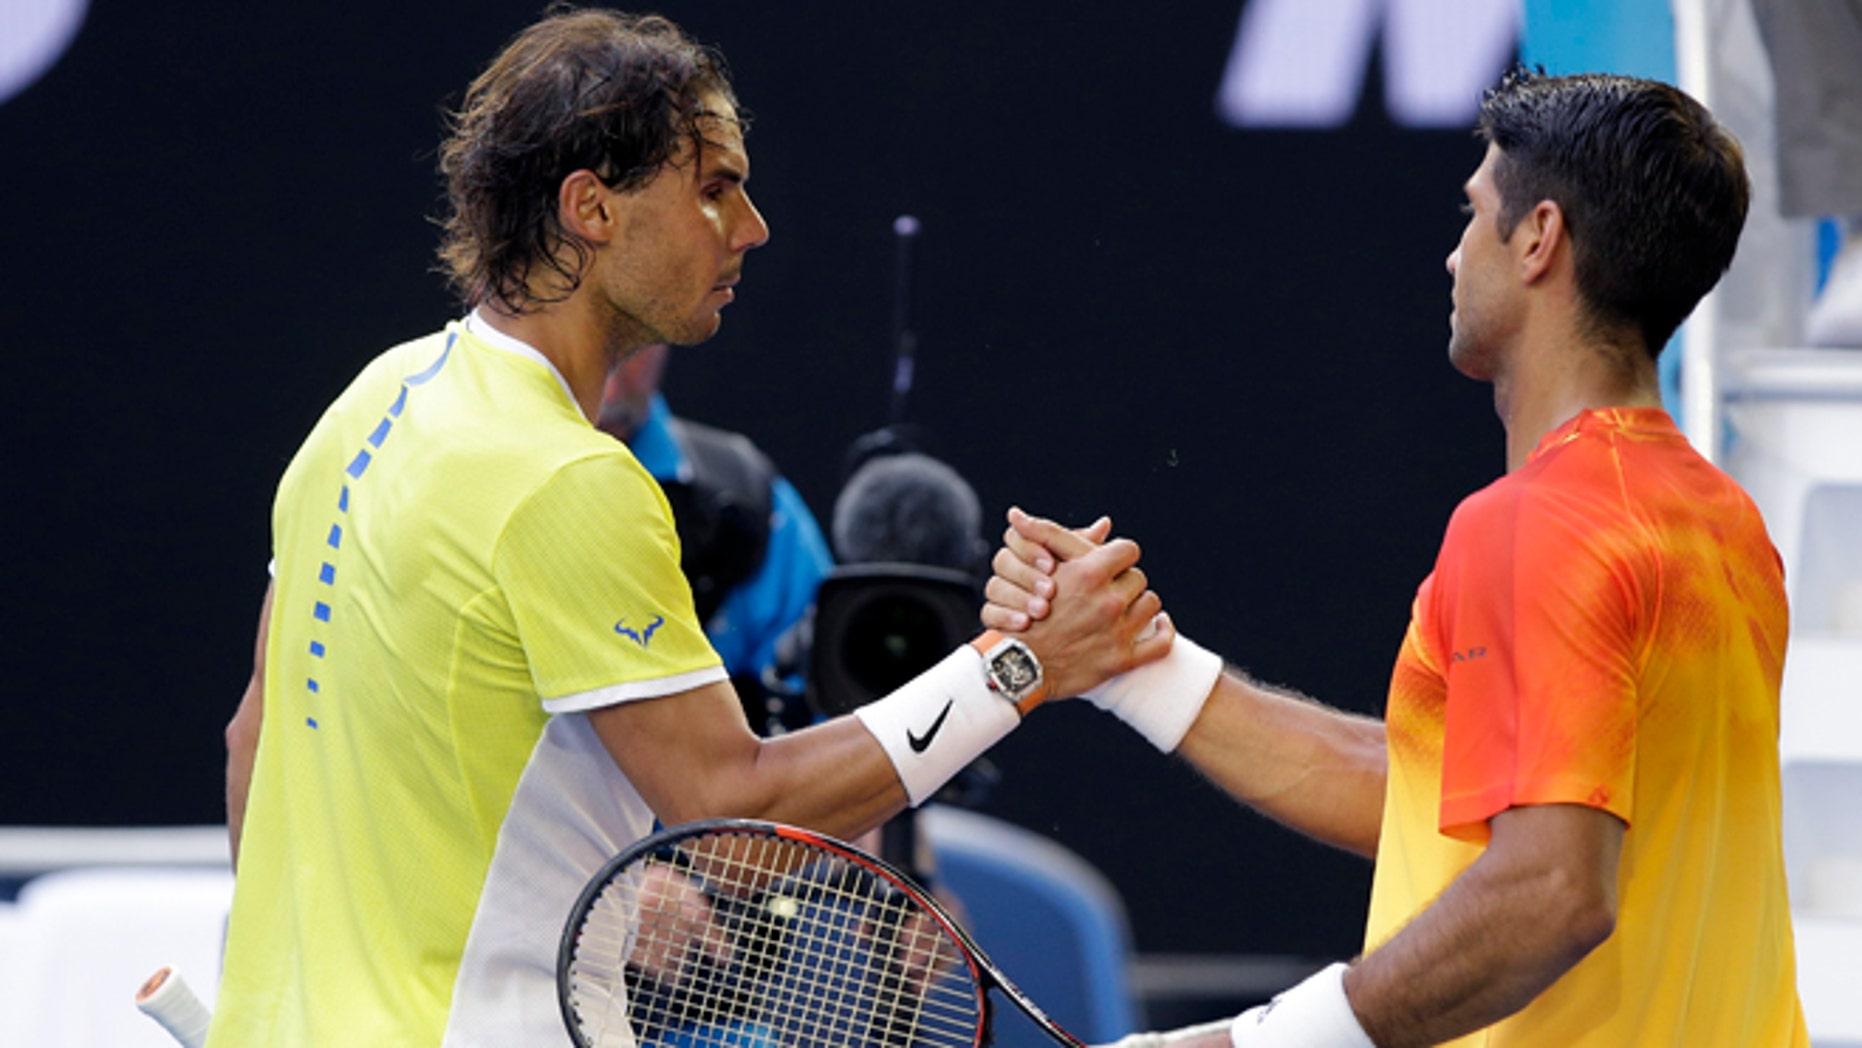 Rafael Nadal, left, of Spain congratulates compatriot Fernando Verdasco after their first round match at the Australian Open tennis championships in Melbourne, Australia, Tuesday, Jan. 19, 2016.(AP Photo/Aaron Favila)